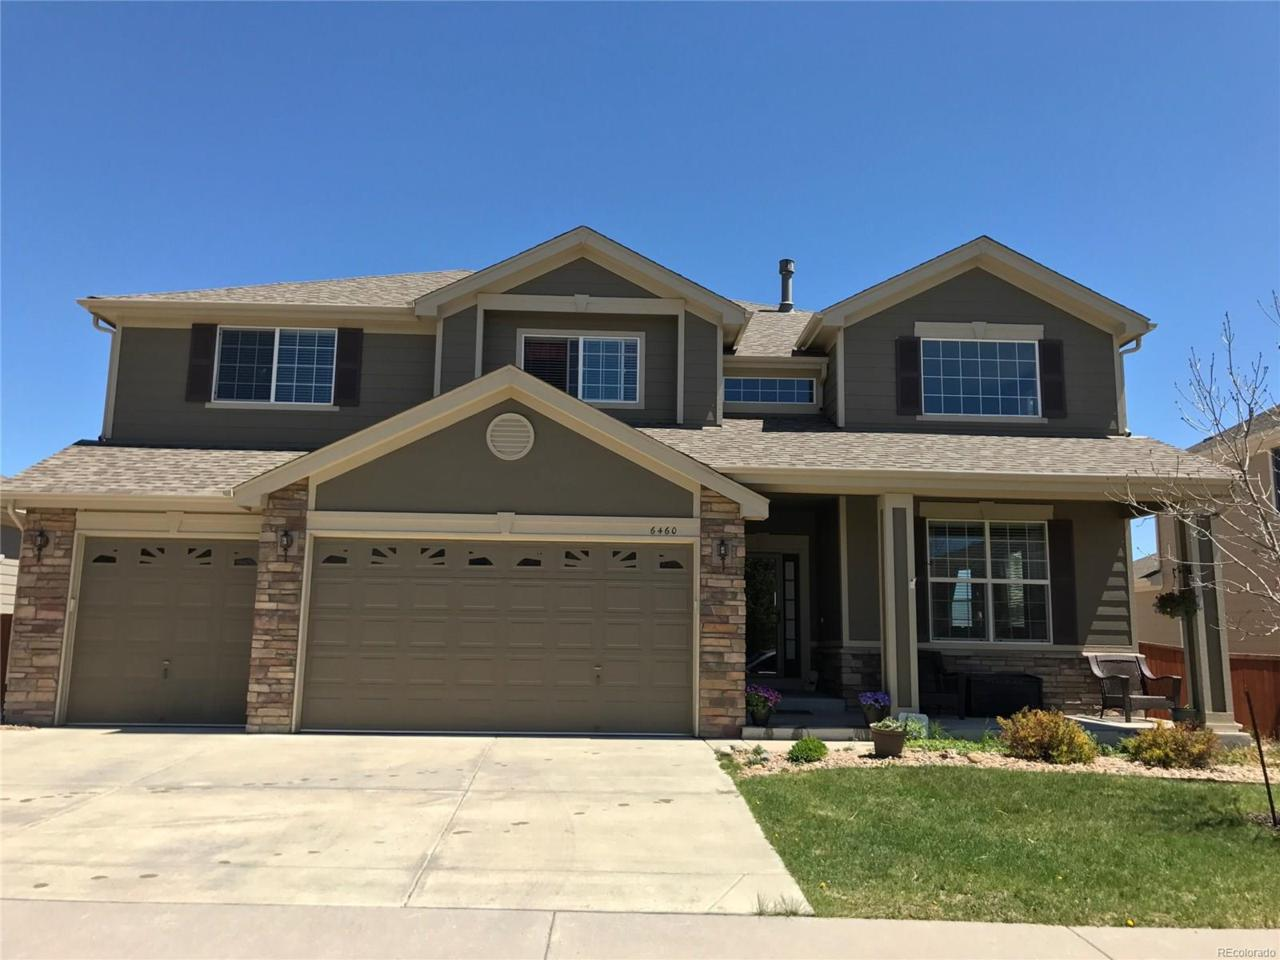 6460 Marble Lane, Castle Rock, CO 80108 (MLS #6319288) :: 8z Real Estate